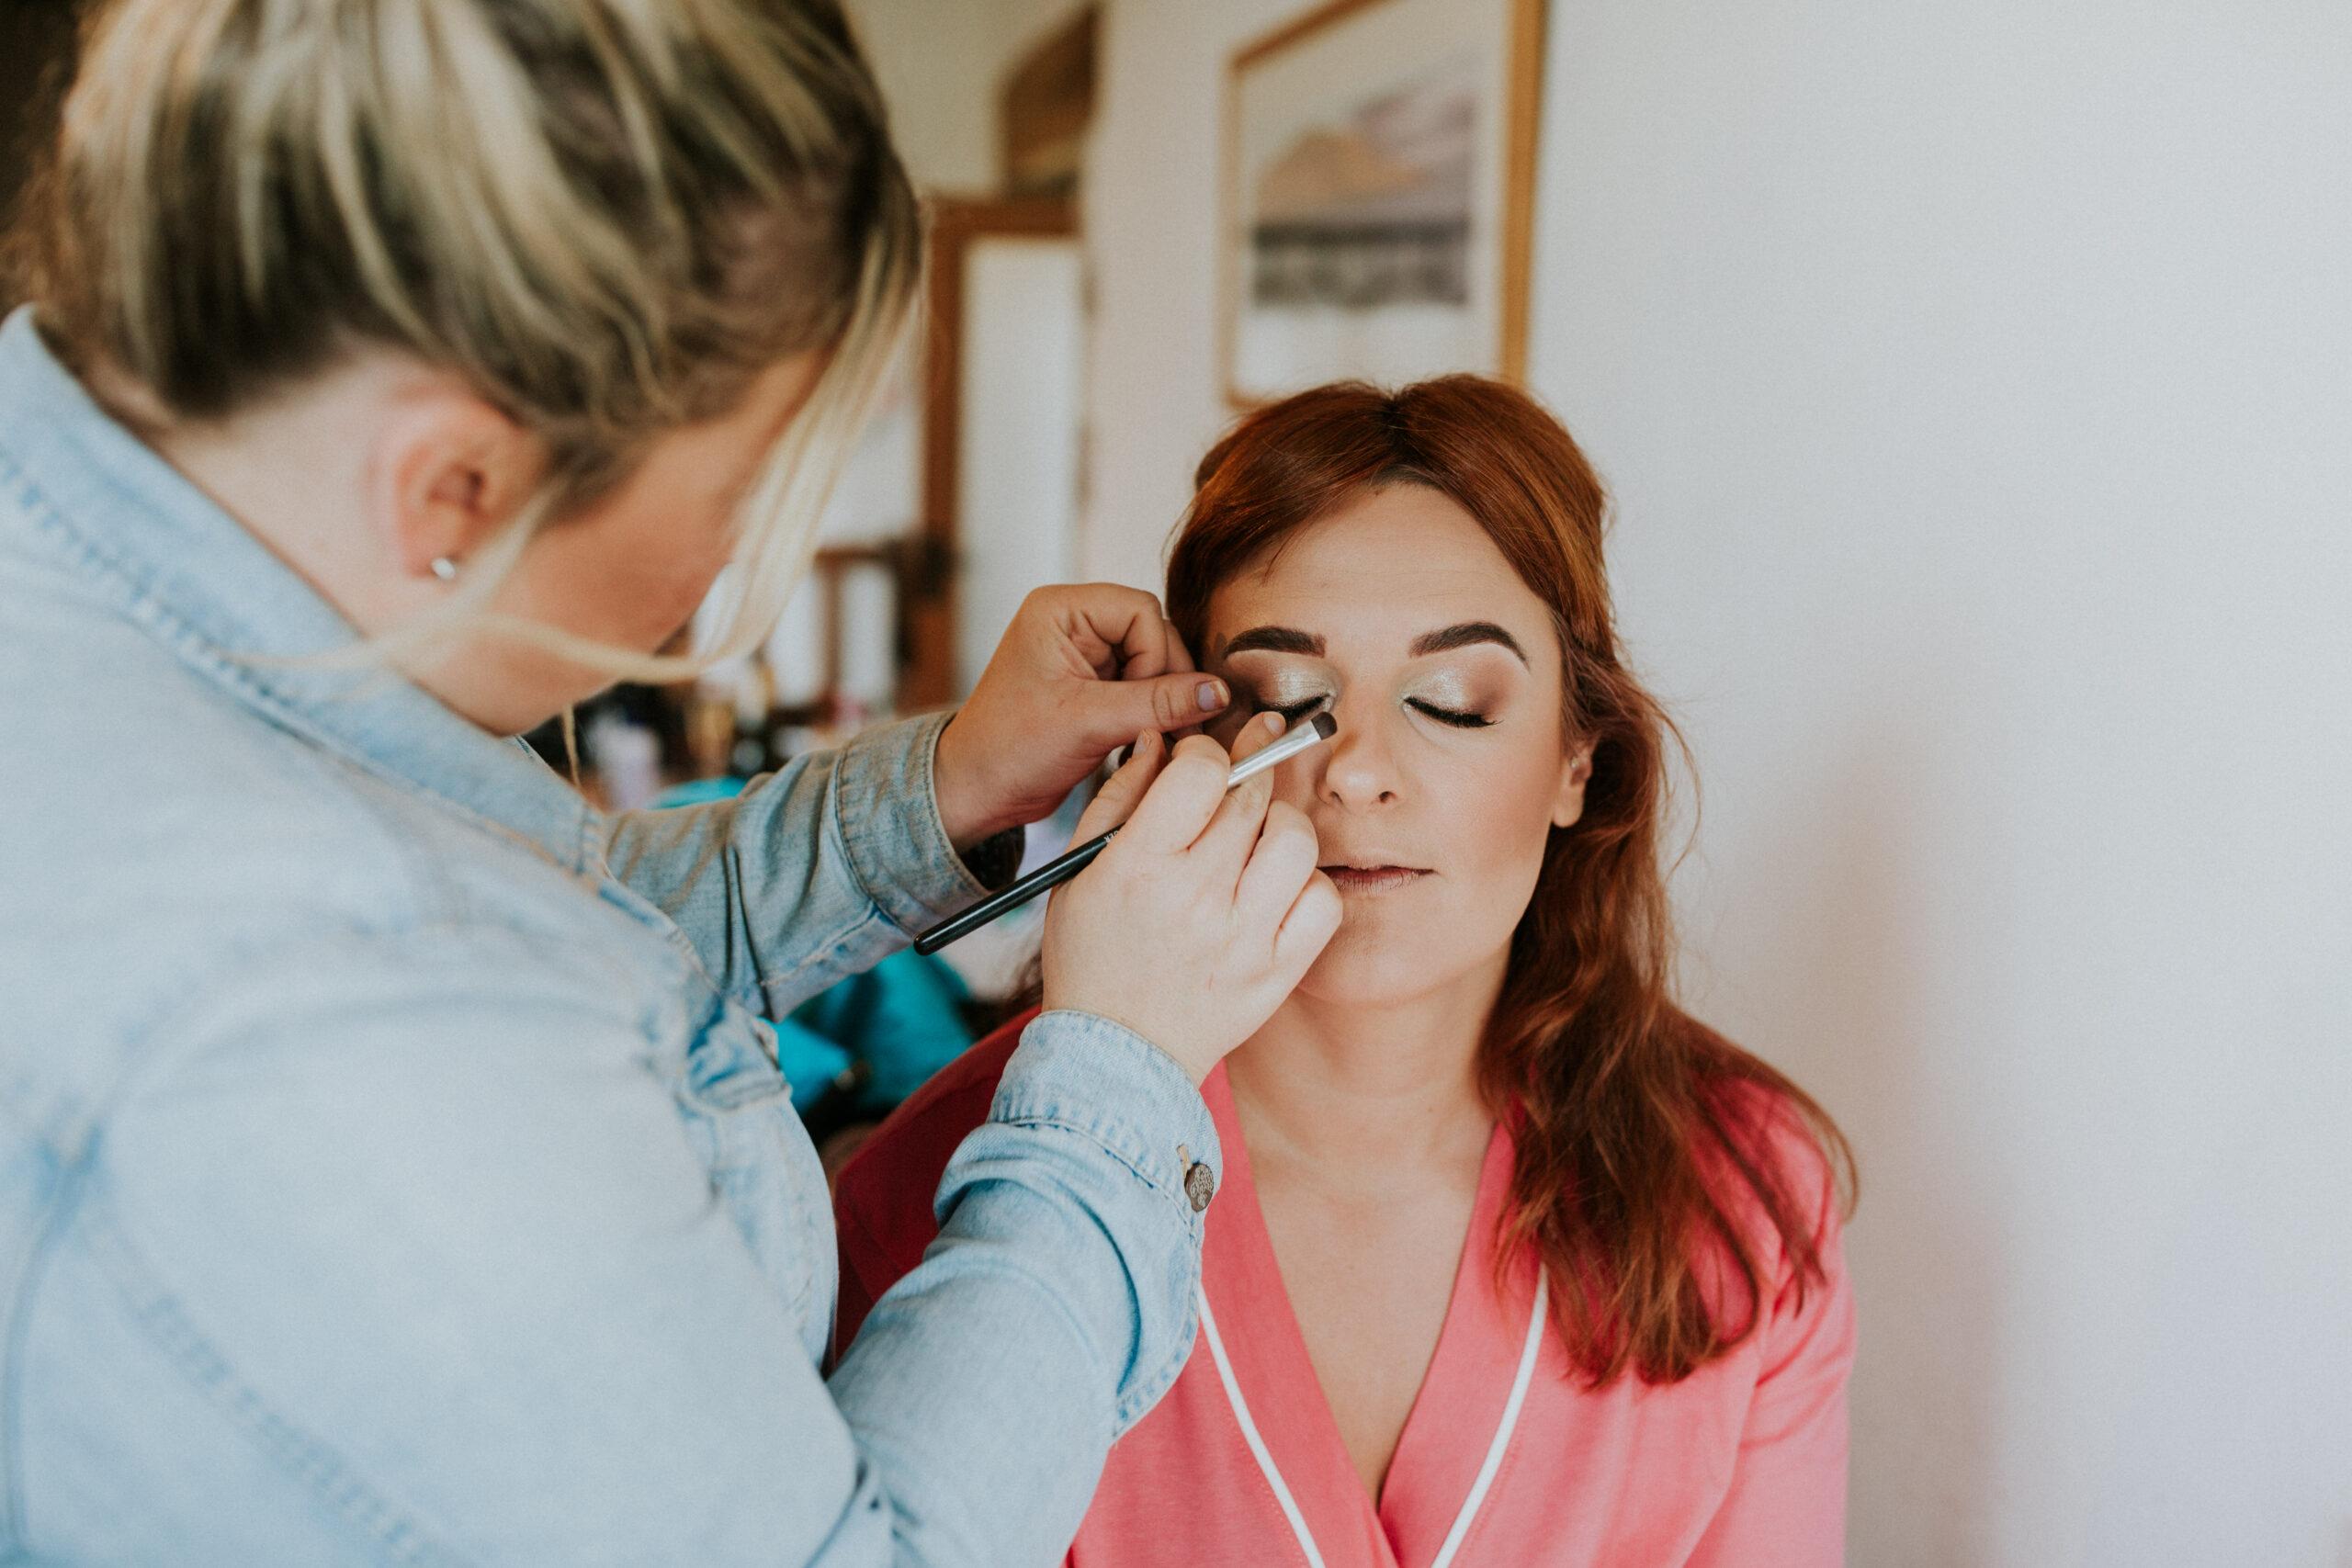 bridesmaid having her make-up done